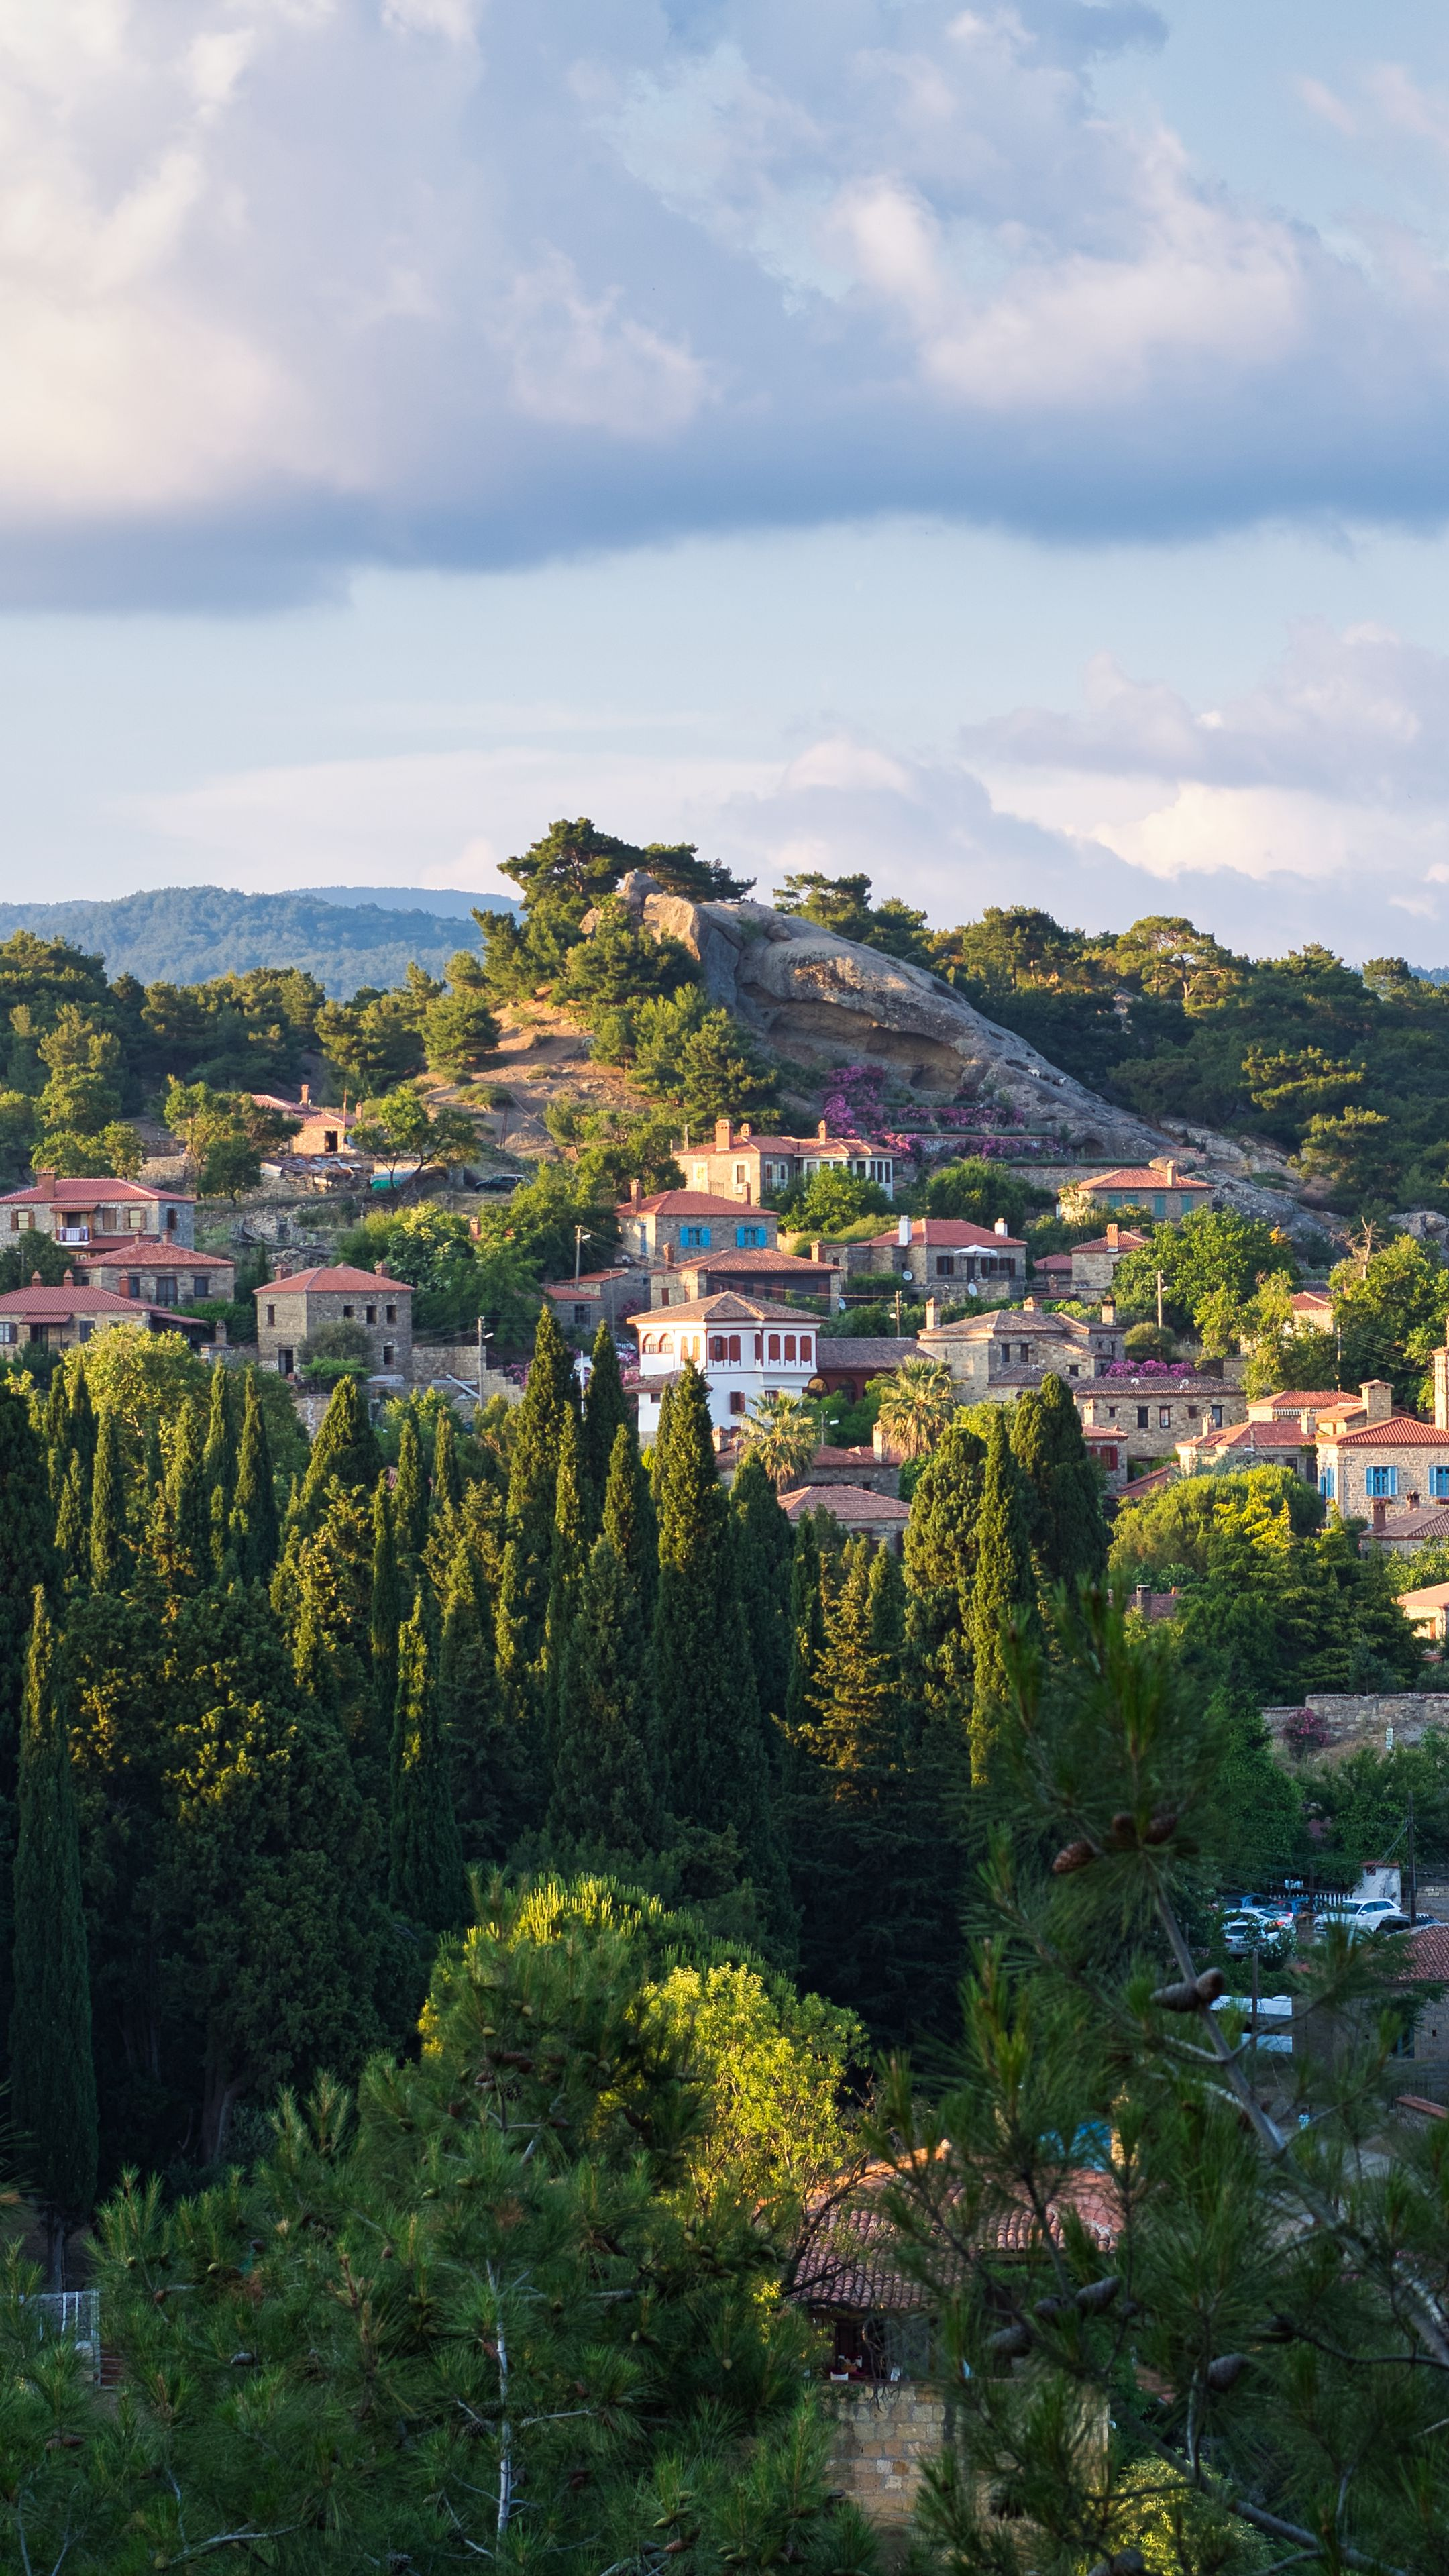 2160x3840 Wallpaper village, mountain, buildings, trees